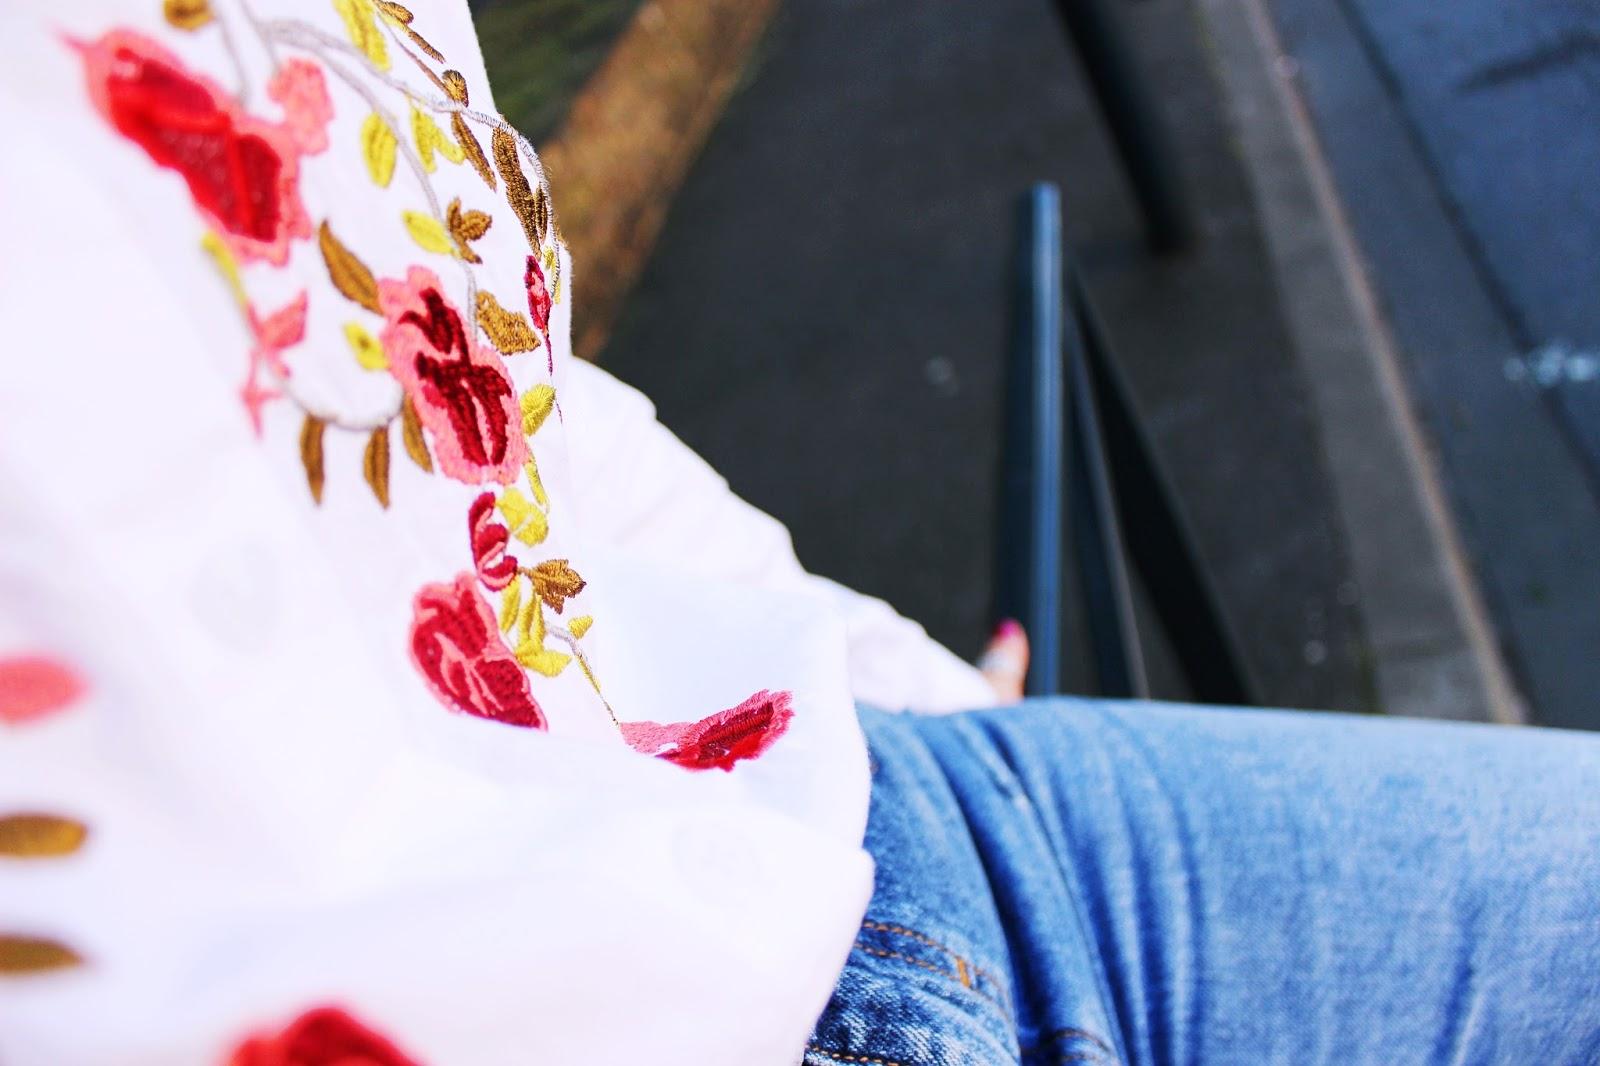 Le chemisier fleuri